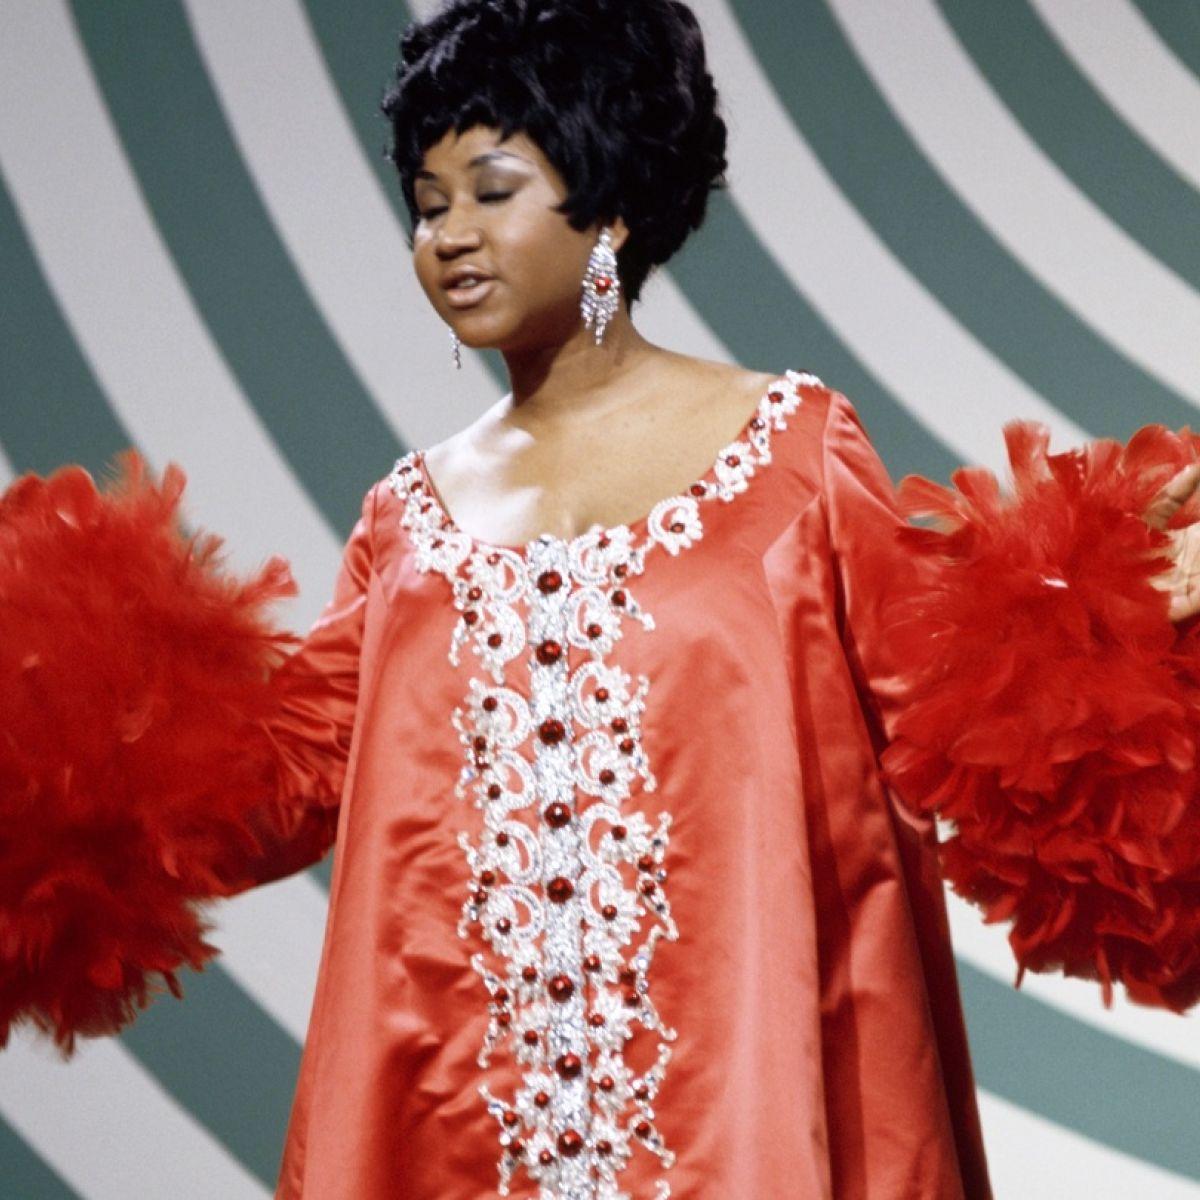 International Women's Day playlist: From Aretha to Whitney